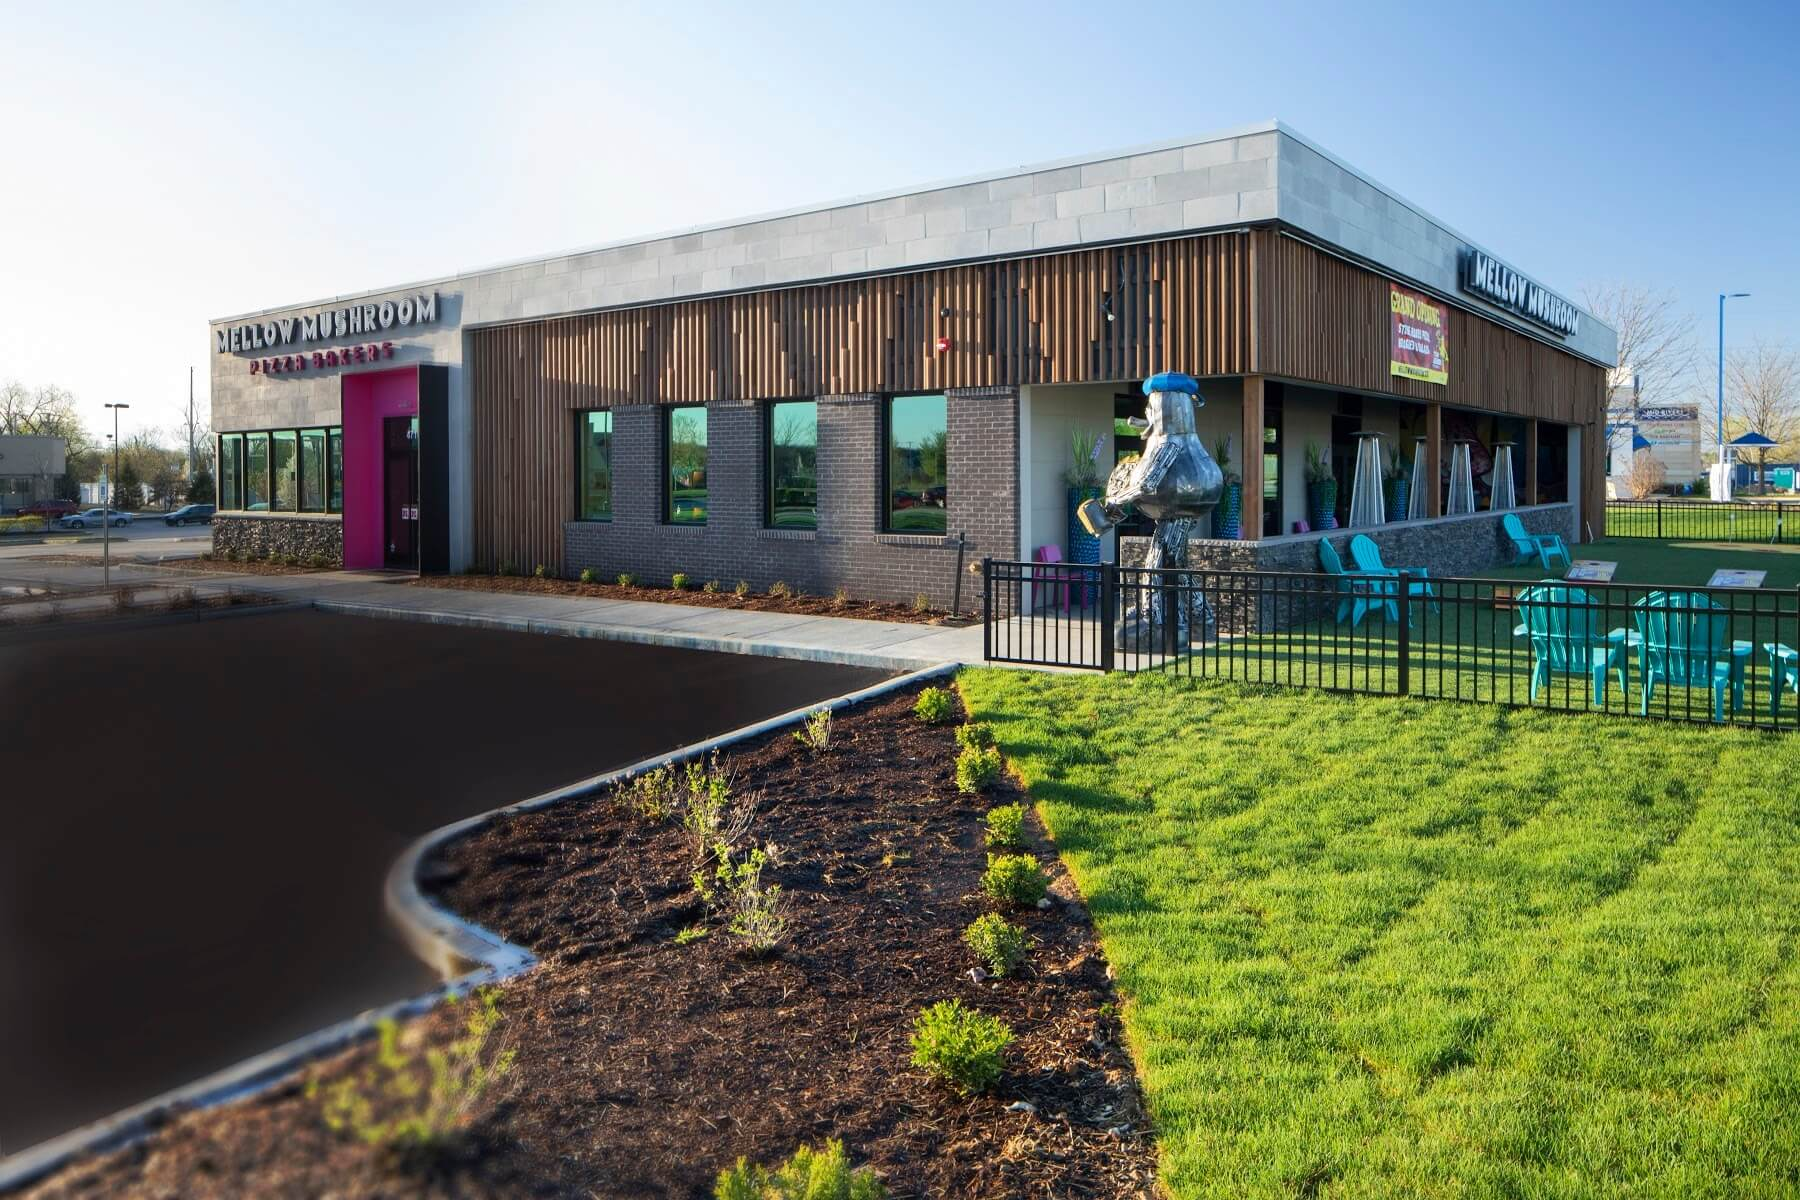 Knoebel Construction completes construction of St. Louis' new Mellow Mushroom restaurant